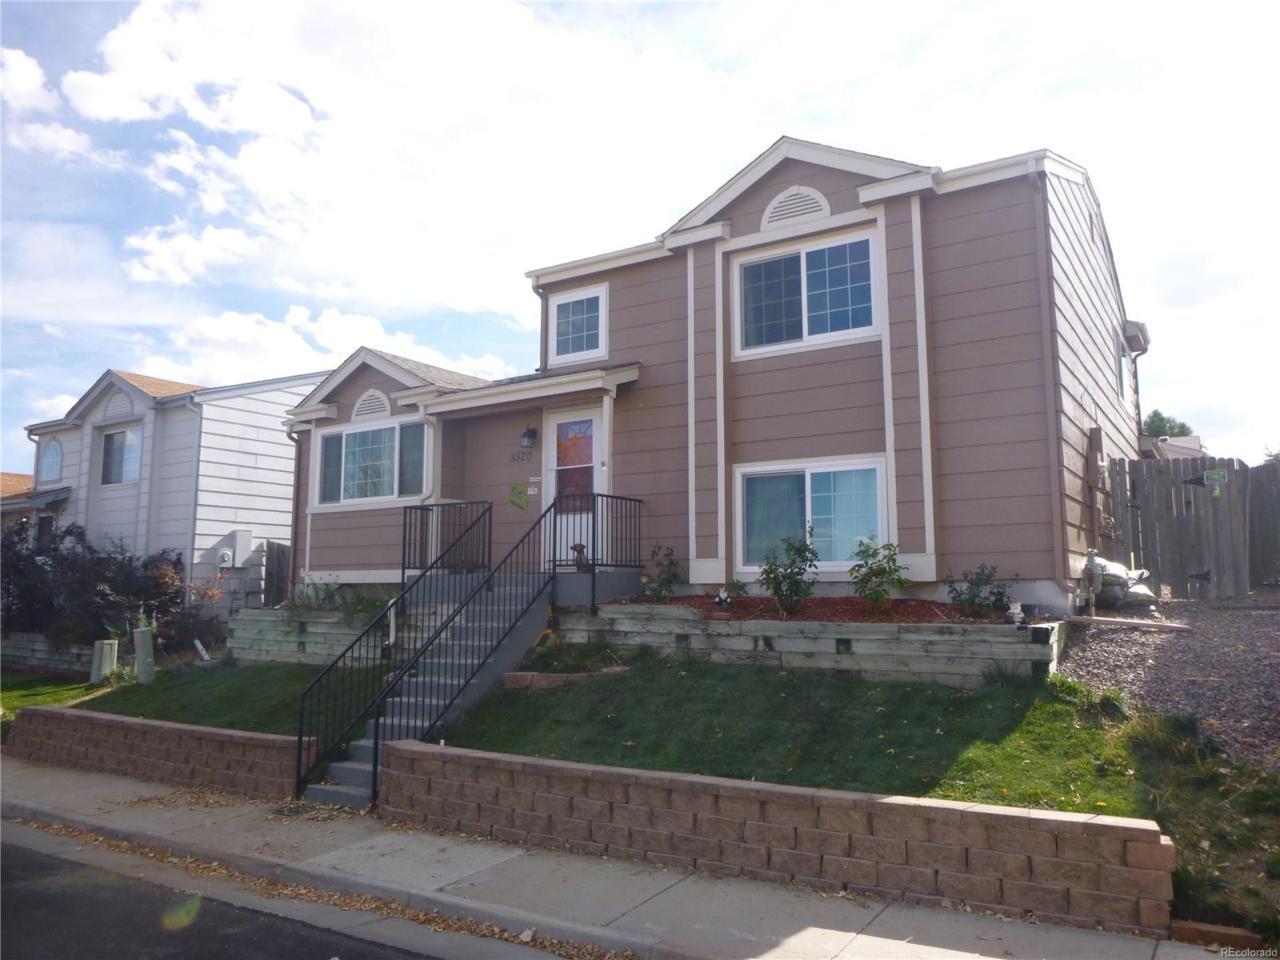 5820 E Caley Lane, Castle Rock, CO 80104 (MLS #8237500) :: 8z Real Estate